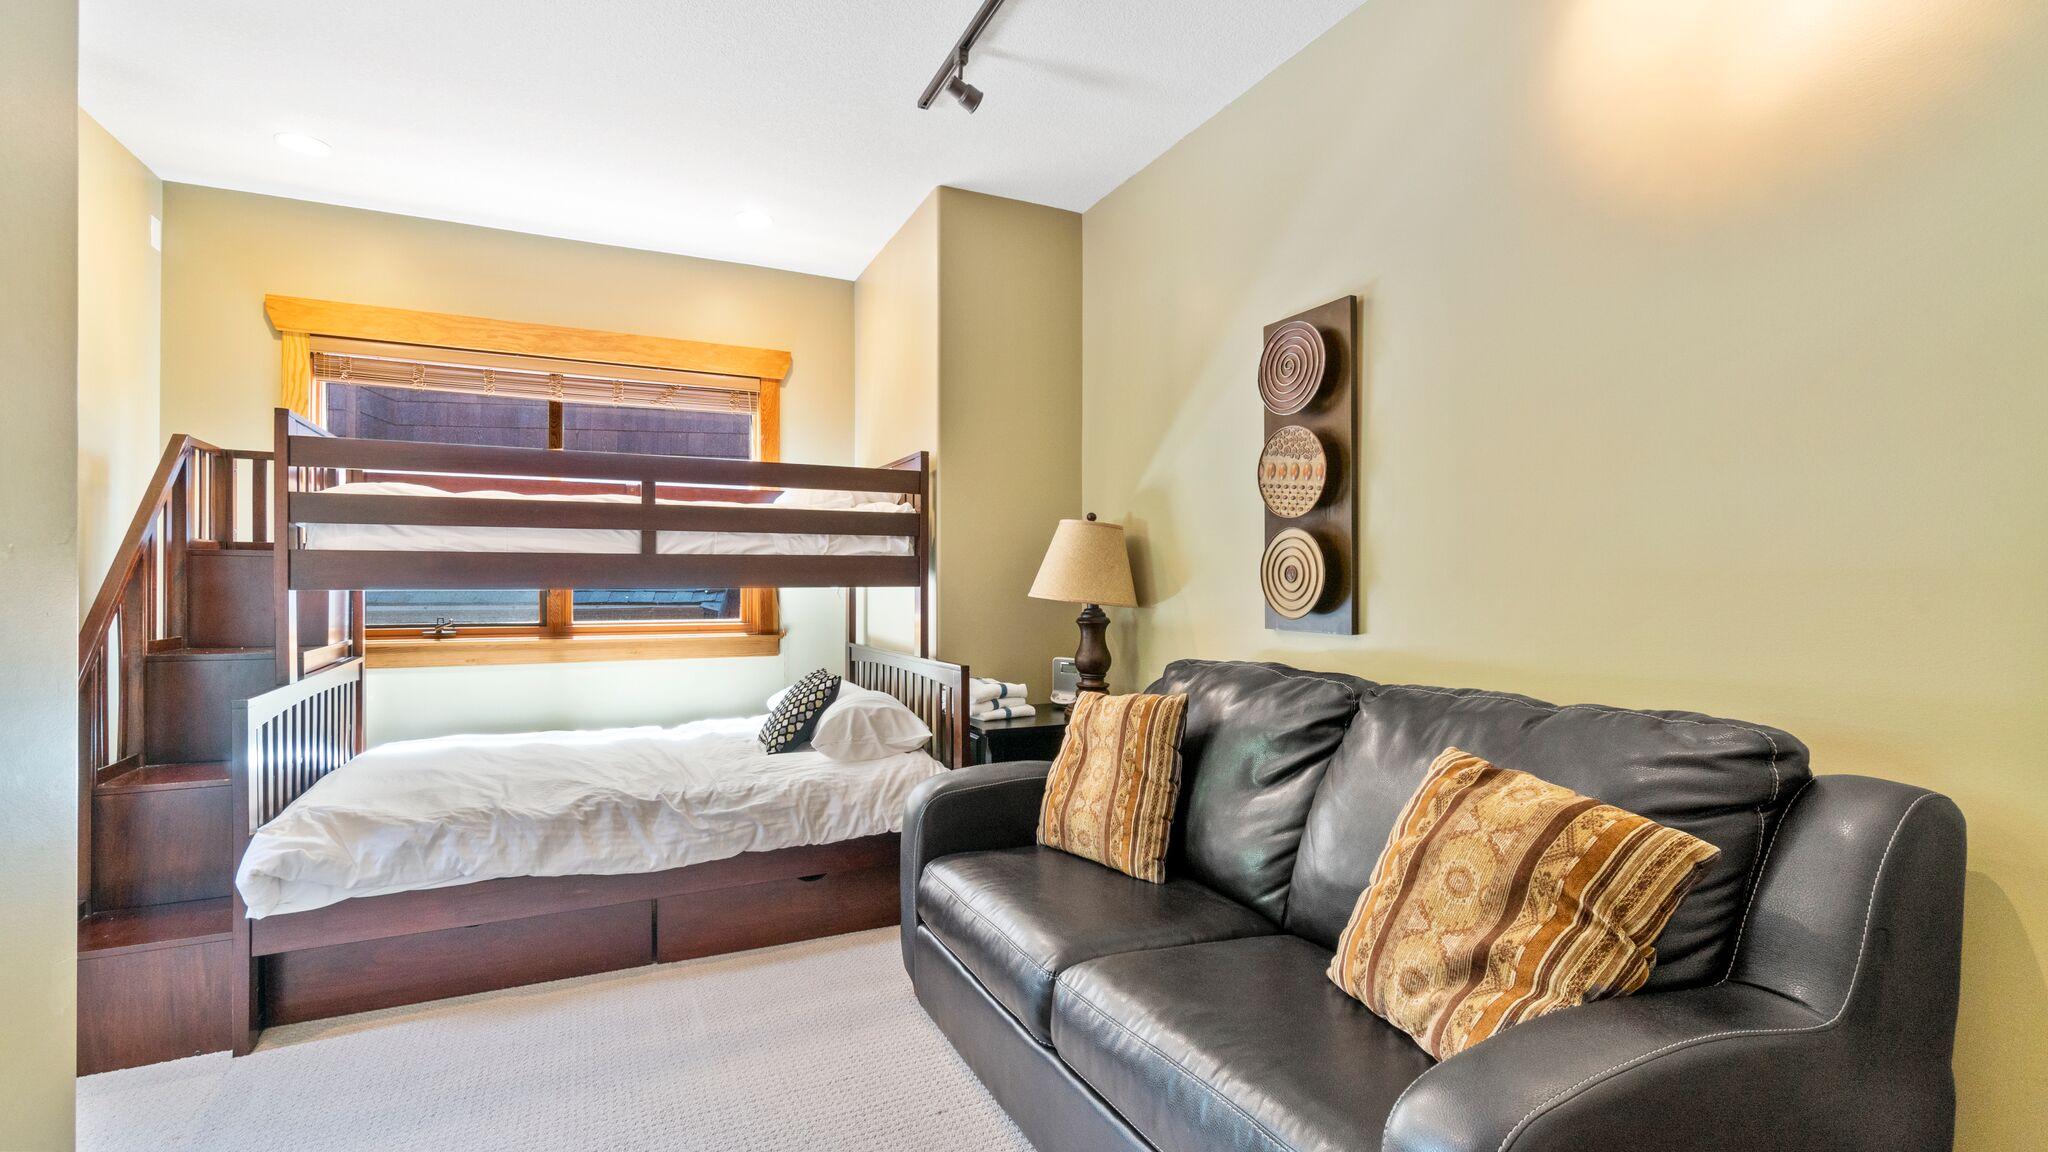 4th Bedroom - Double/Single Bunk